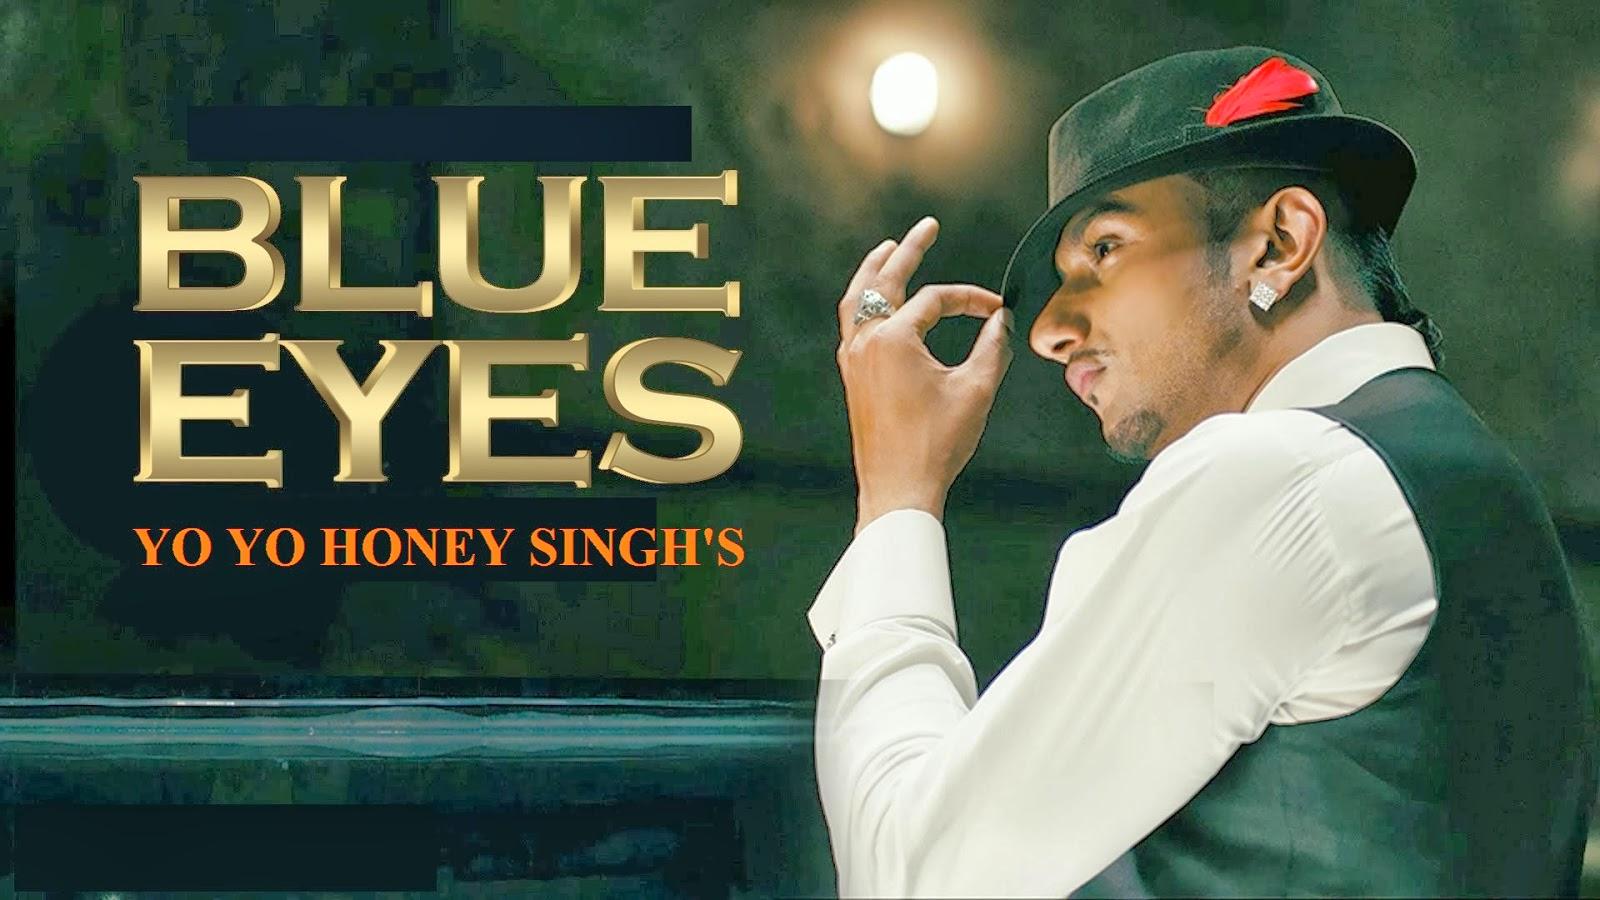 List of latest famous songs of yoyo honey singh 2014.